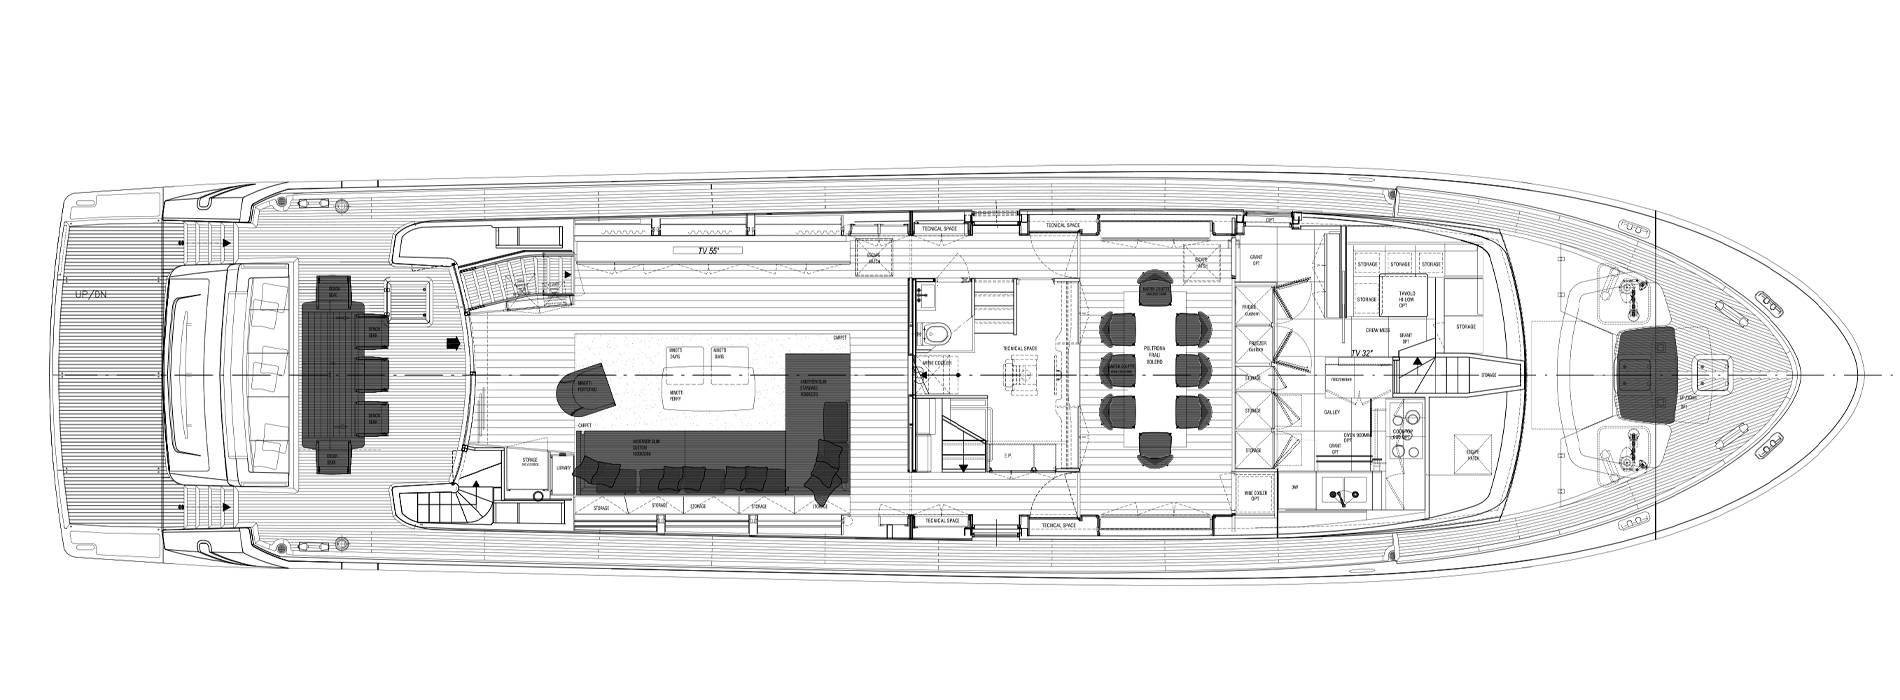 Sanlorenzo Yachts SL96-684 Main deck